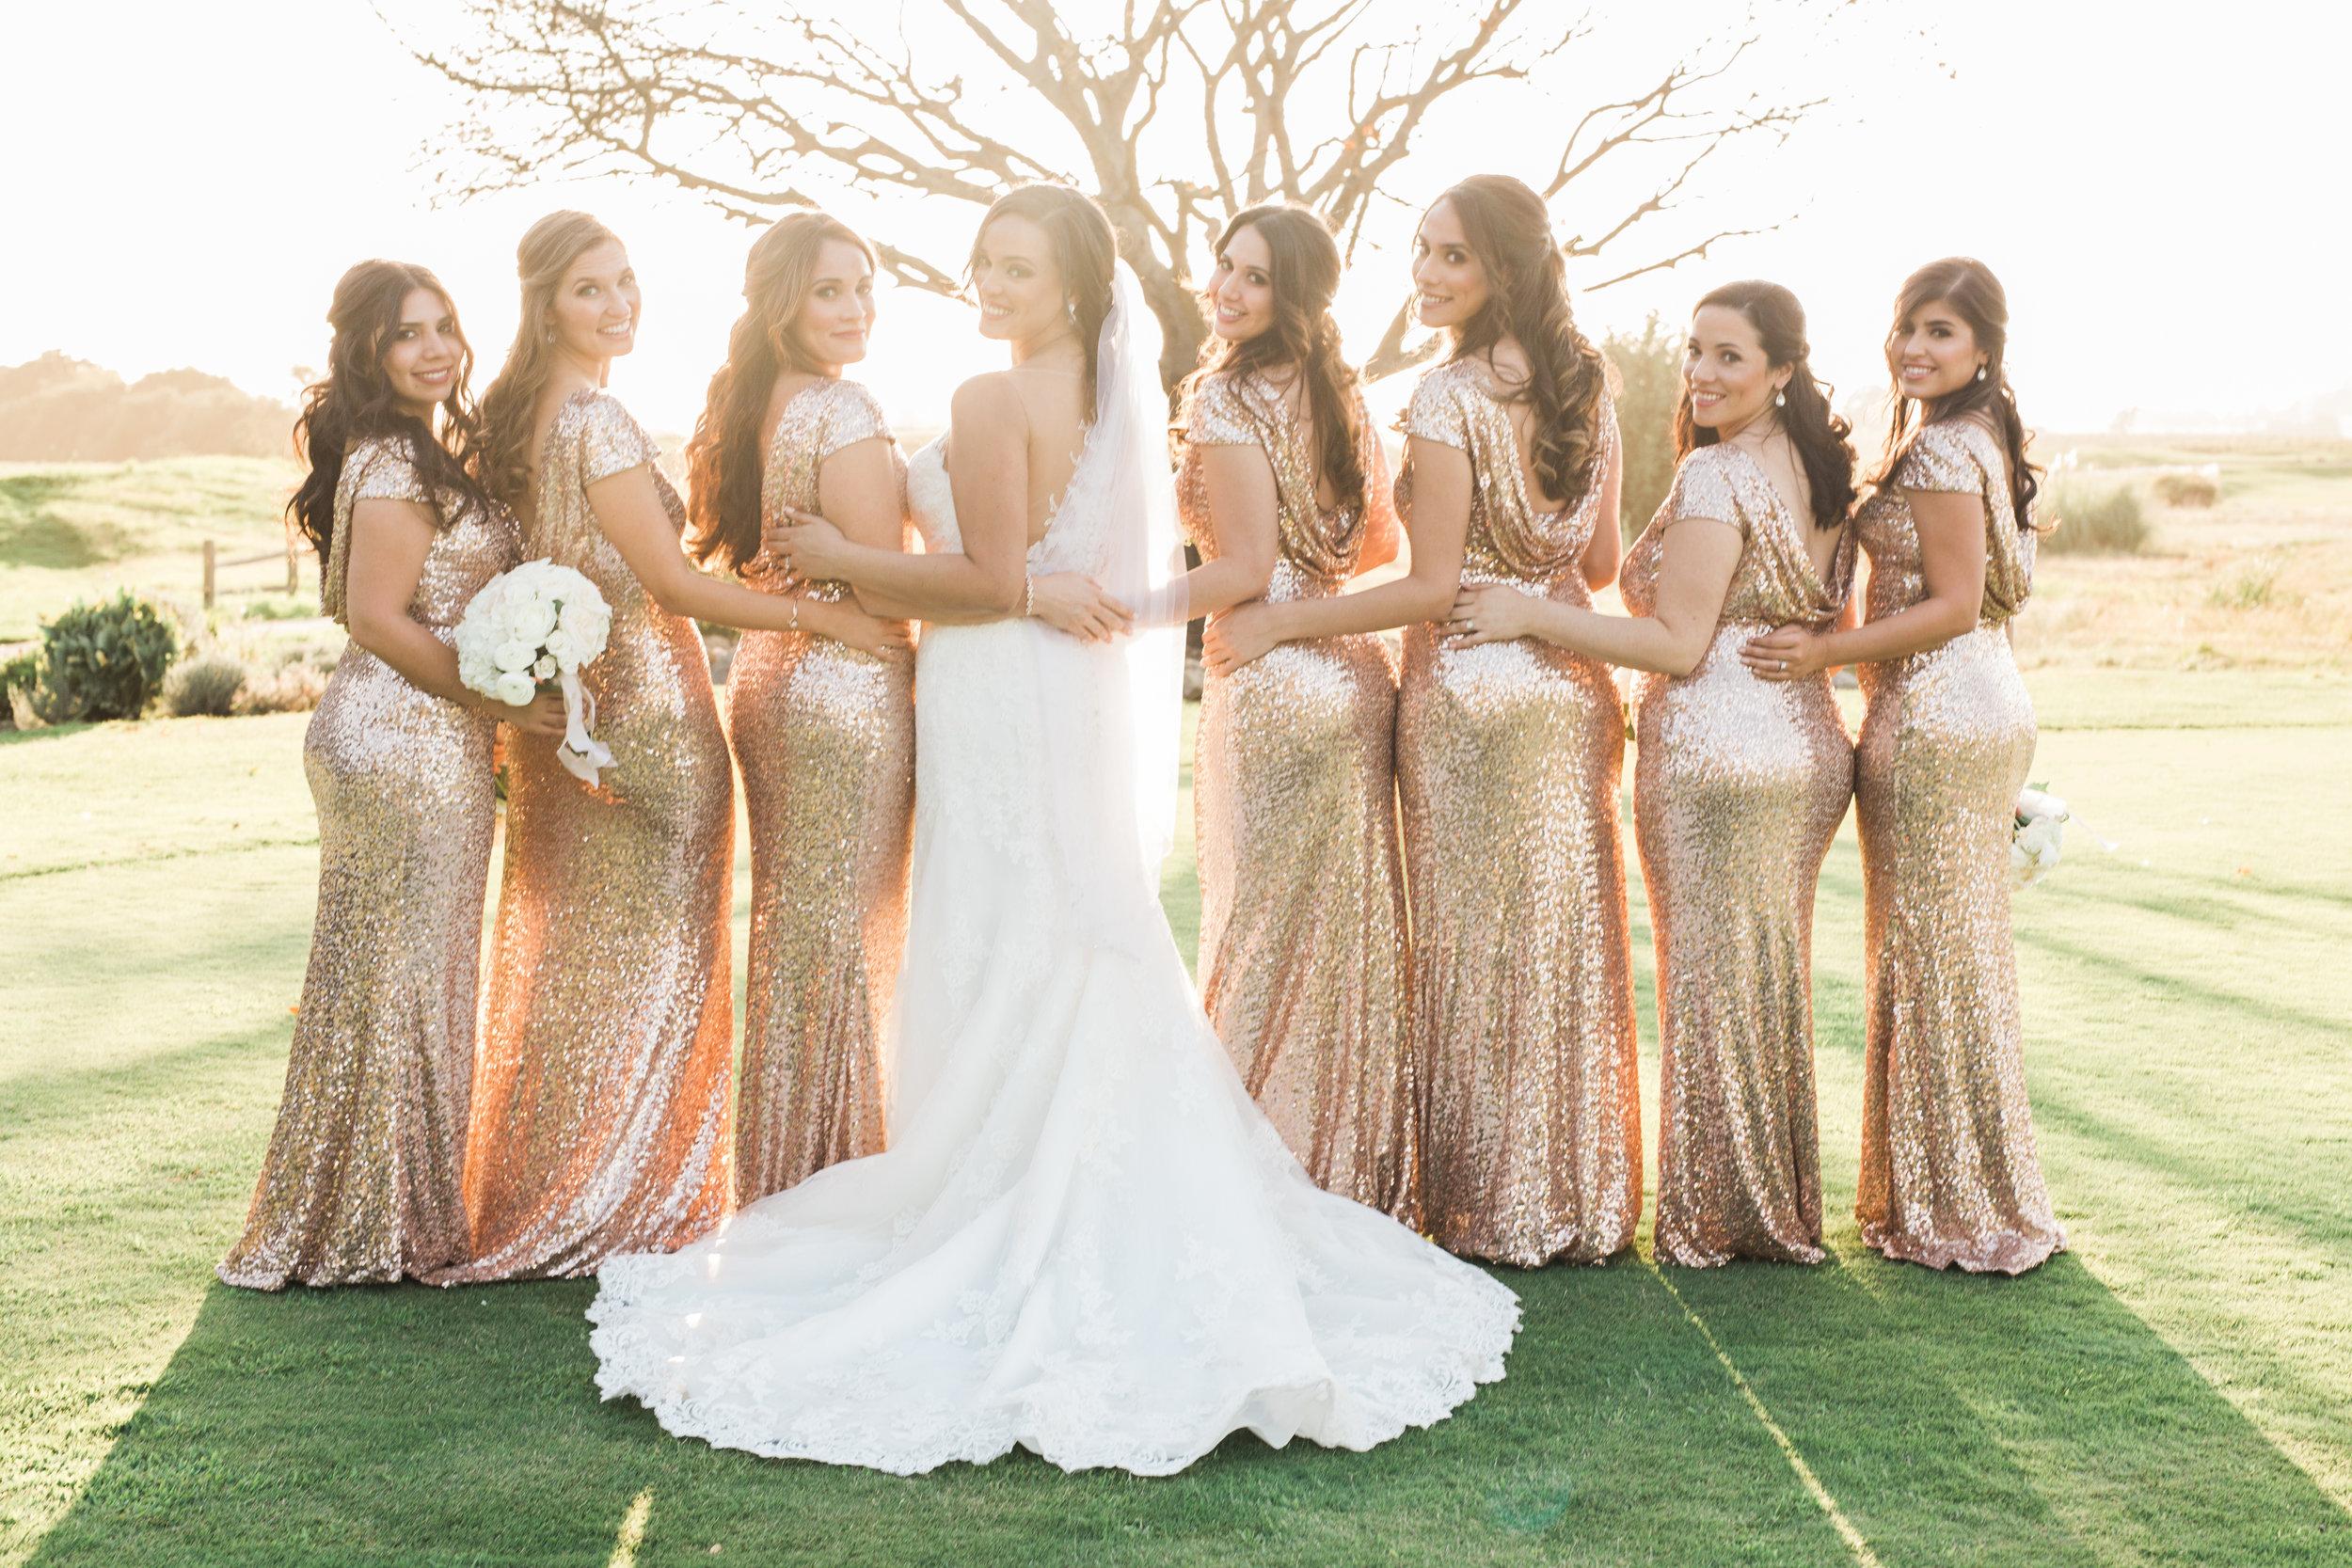 jenny-and-george-wedding-roque-events-meyerott-photography 954.jpg